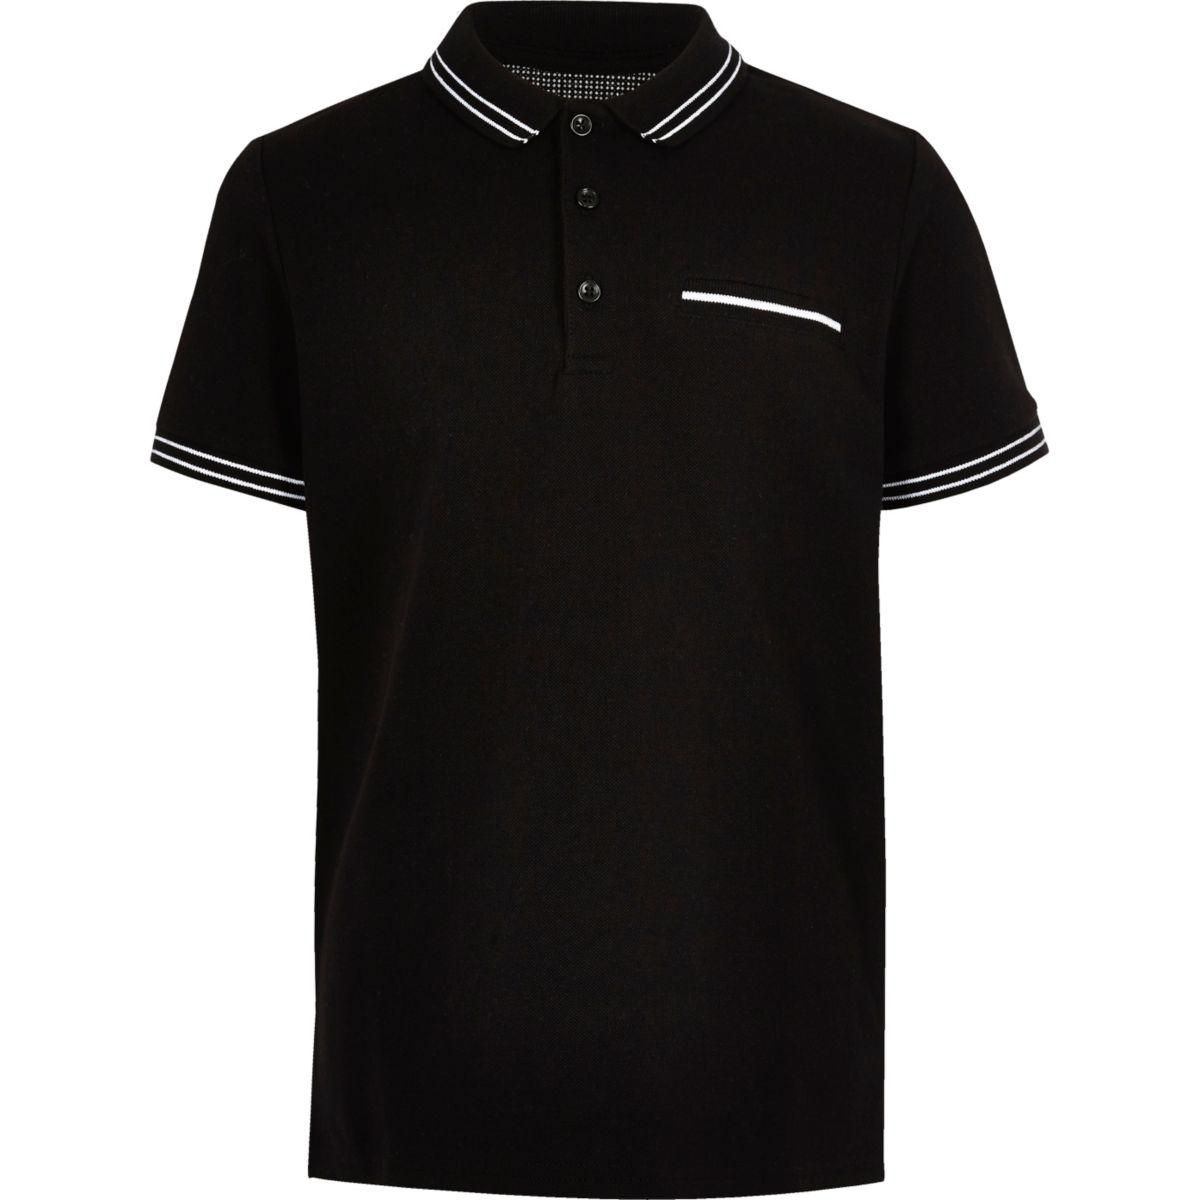 Boys black tipped short sleeve polo shirt